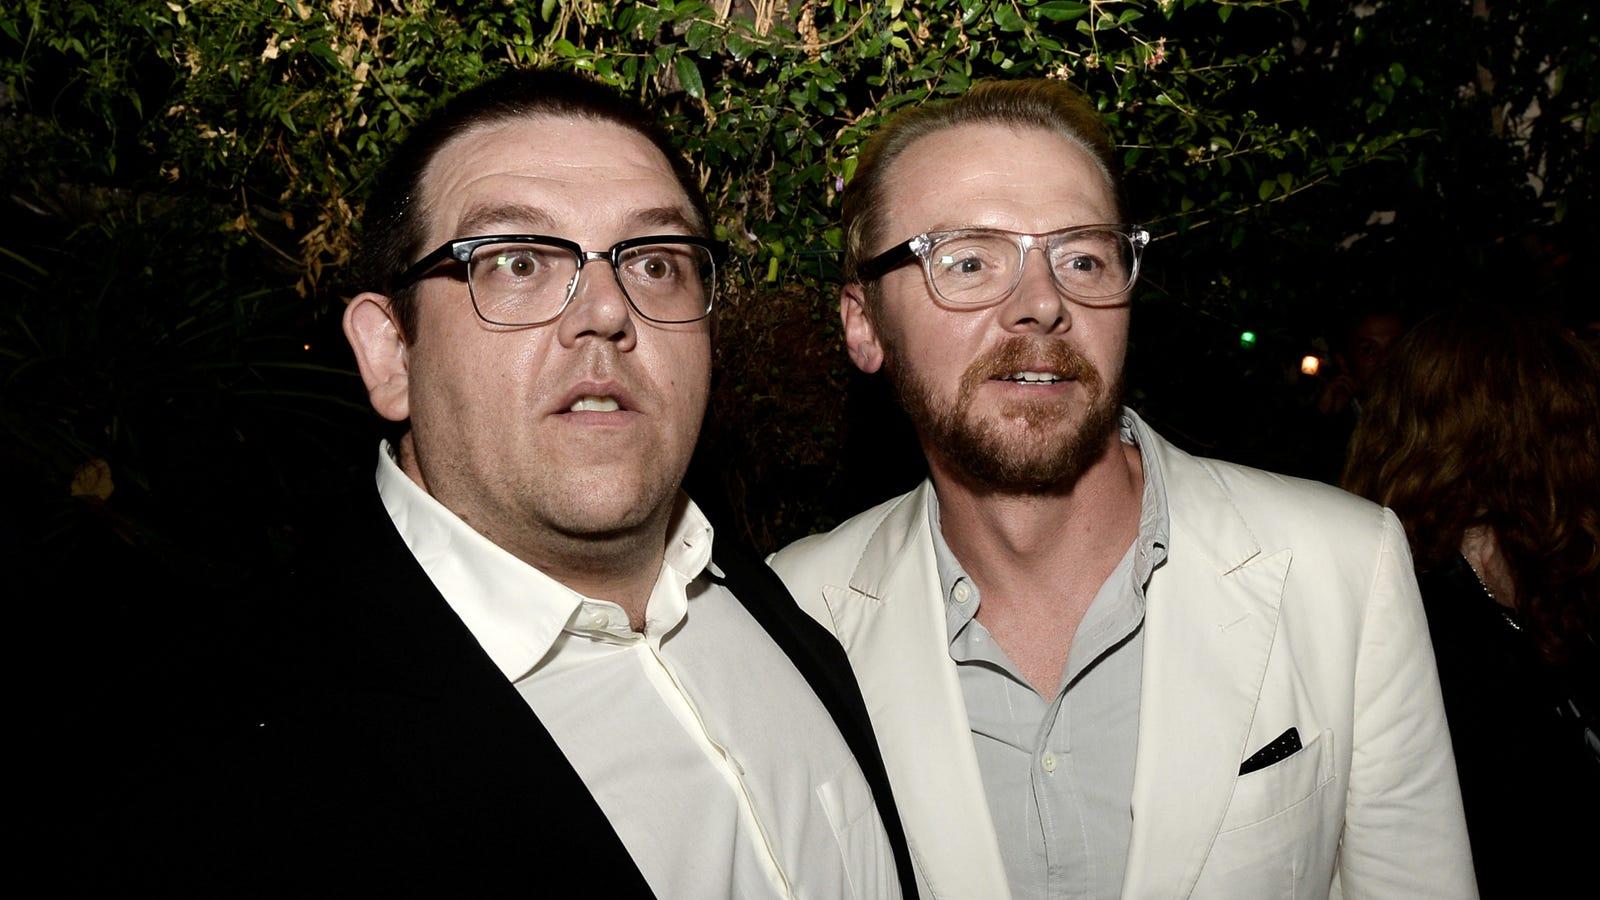 Nick Frost and Simon Pegg making Swedish murder movie Svalta